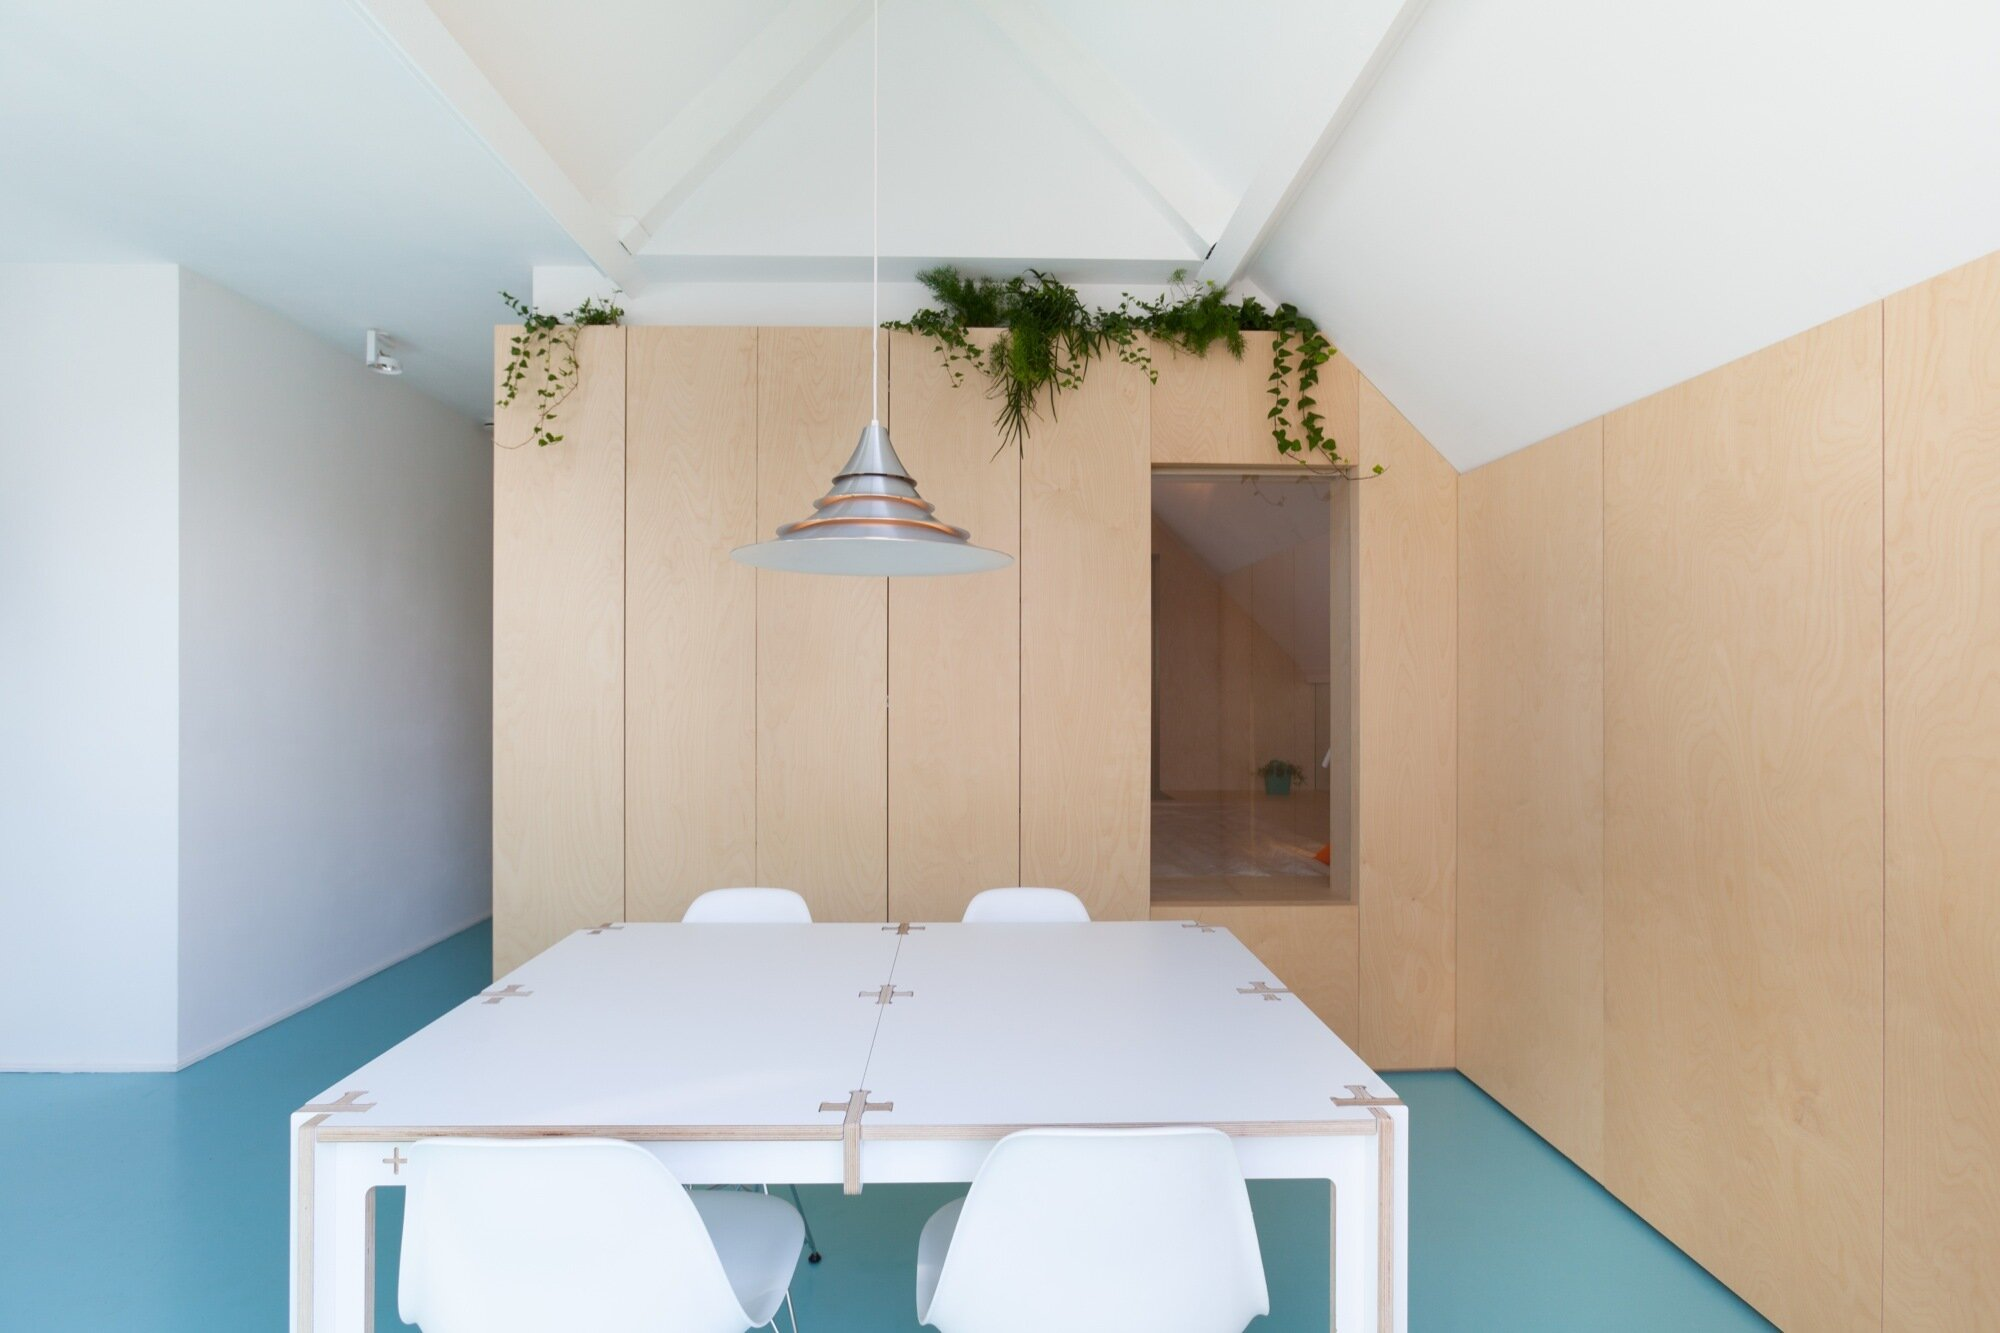 Amsterdam Urban Loft - Bureau Fraai - Amsterdam - Dining Room - Humble Homes